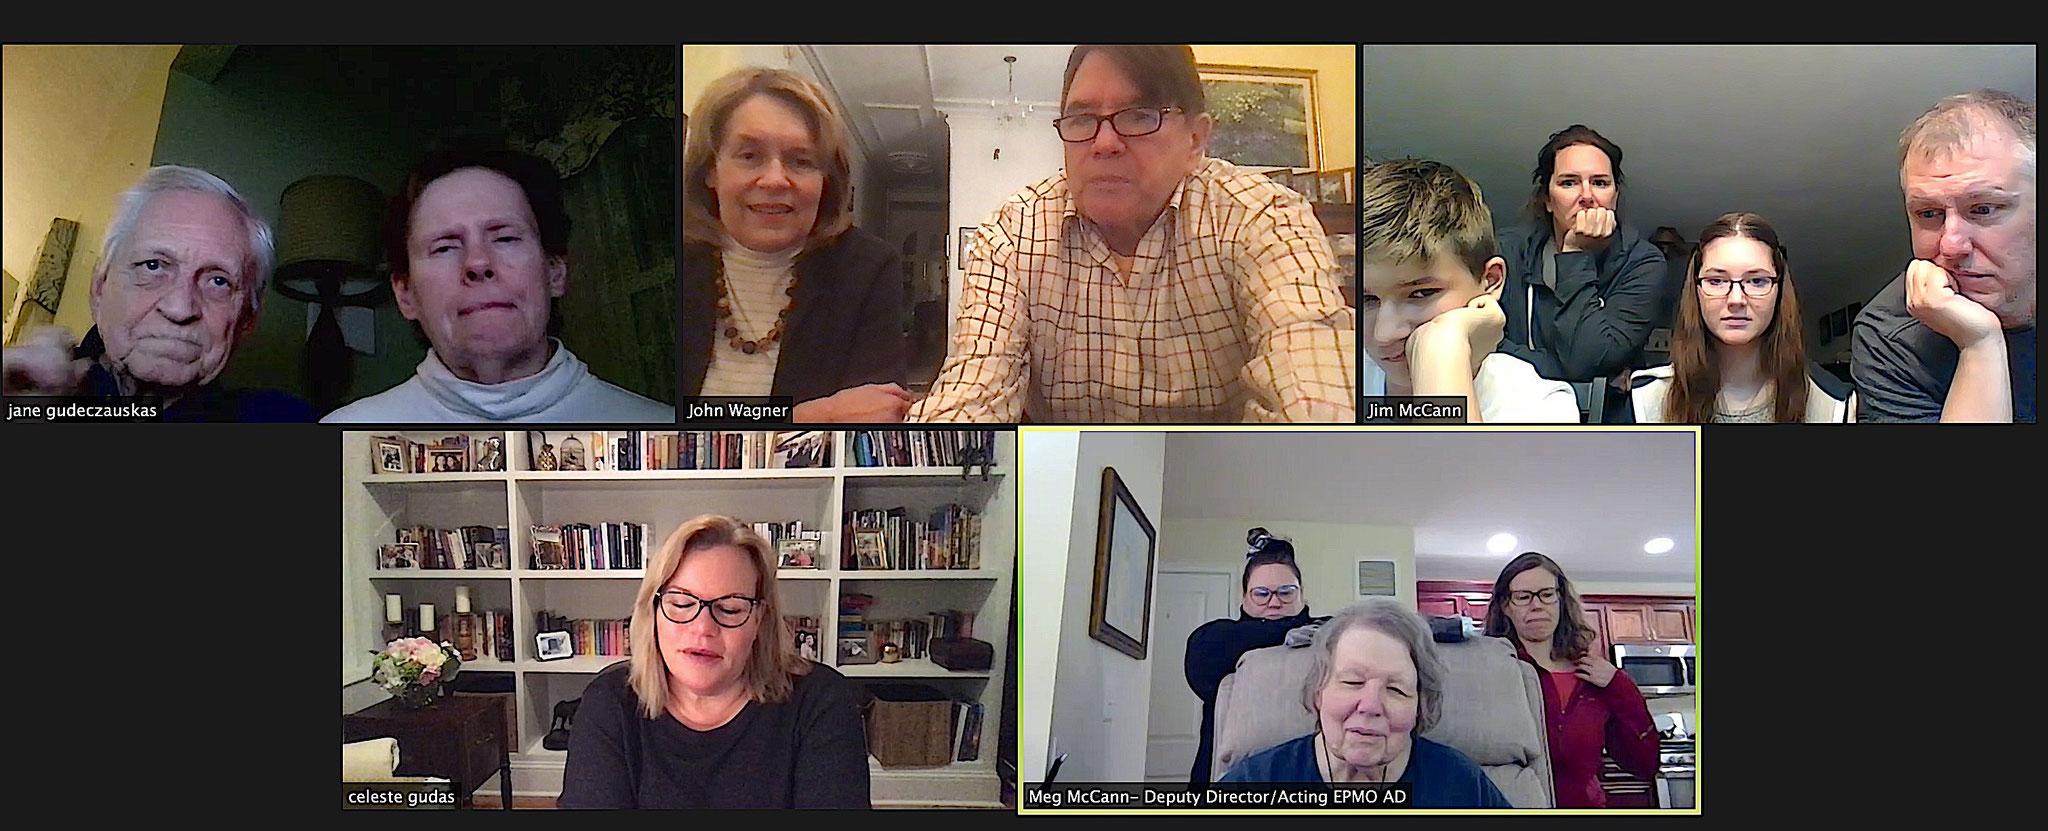 Zoom, fall 2020, Covid time, Jerry & Jane, Lorraine & John, Connie & Jim & family; Celeste, and Erin, Margaret, & Meg